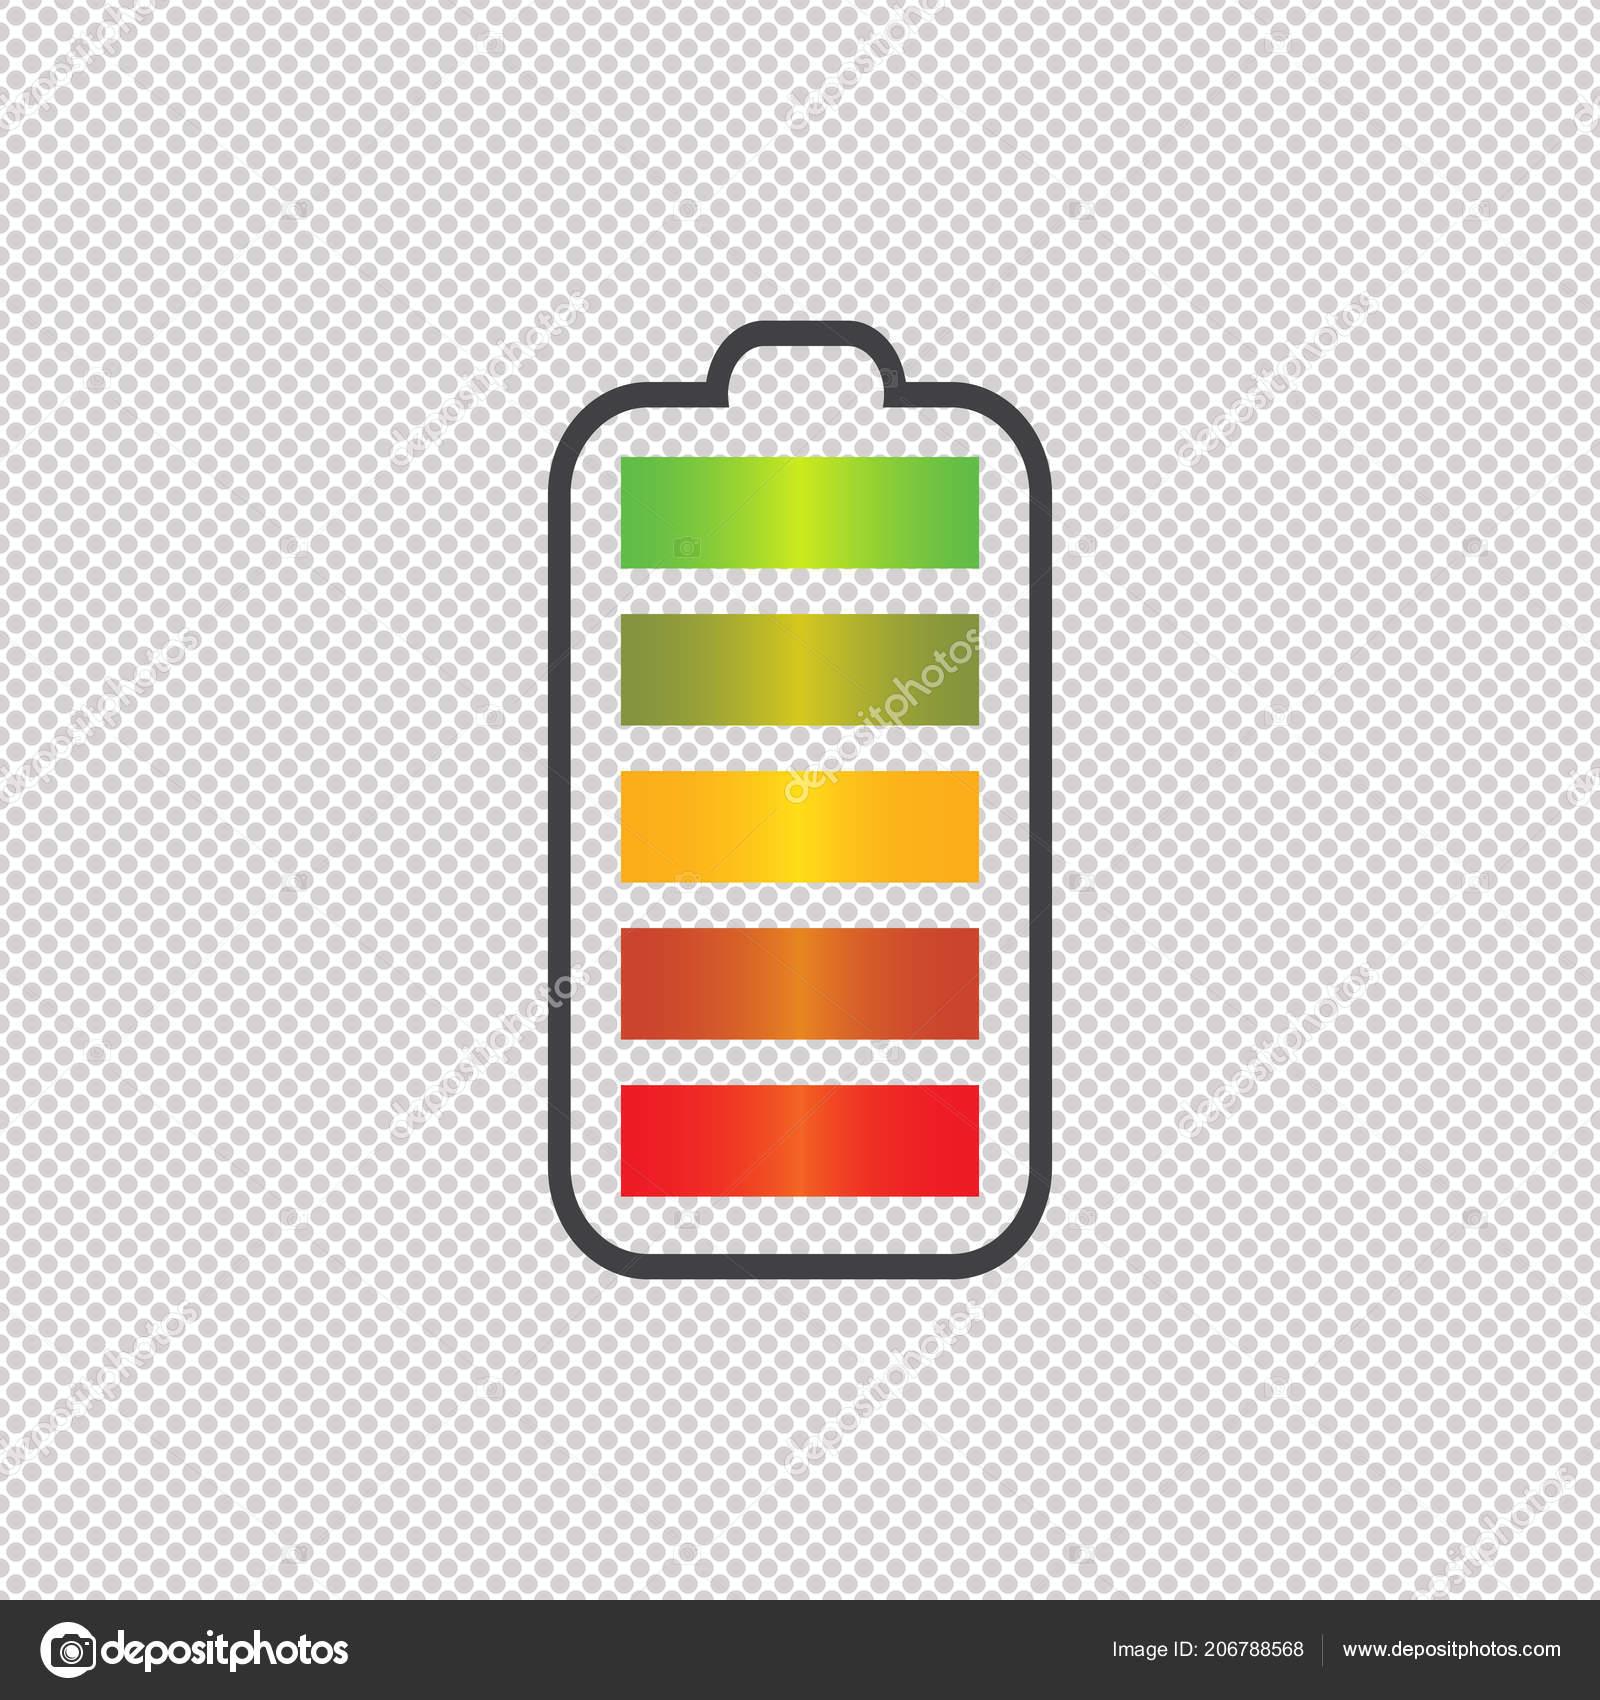 картинка индикатор заряда батареи замену салонного